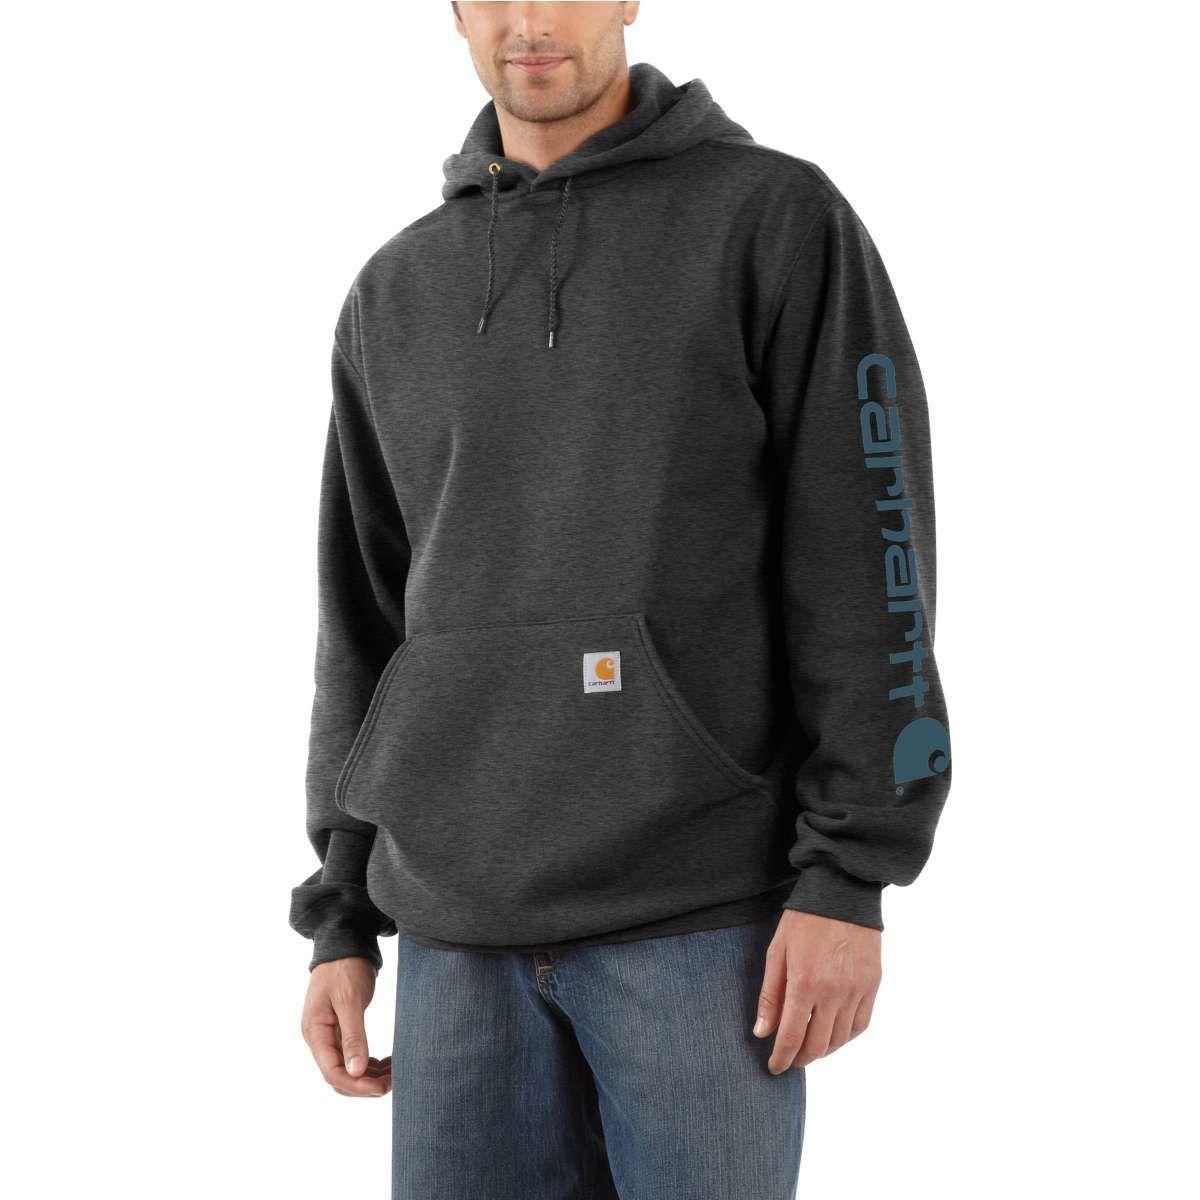 Carhartt Men's Midweight Hooded Logo Sweatshirt - Black, L